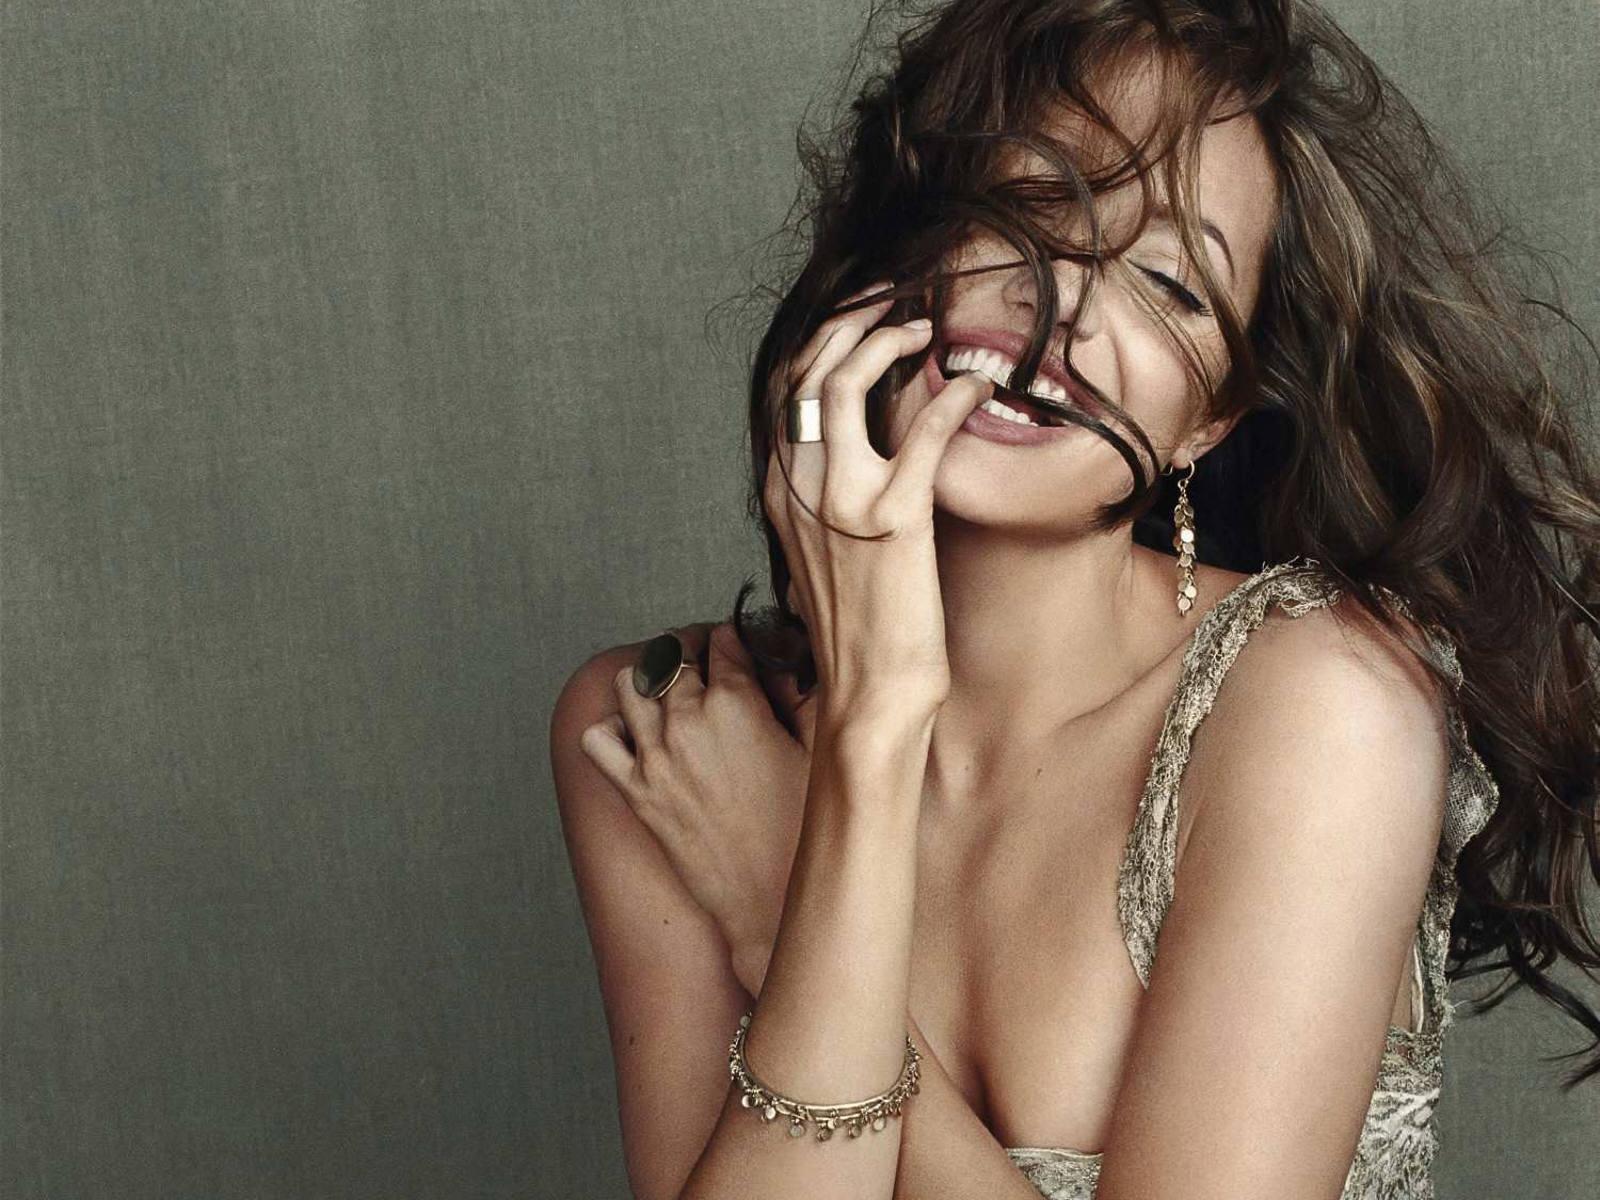 http://3.bp.blogspot.com/_p2EstT5Z5BU/THtqO-VeydI/AAAAAAAAAsY/S2eNuiL0aTA/s1600/Angelina+Jolie+Wallpapers+3.jpg